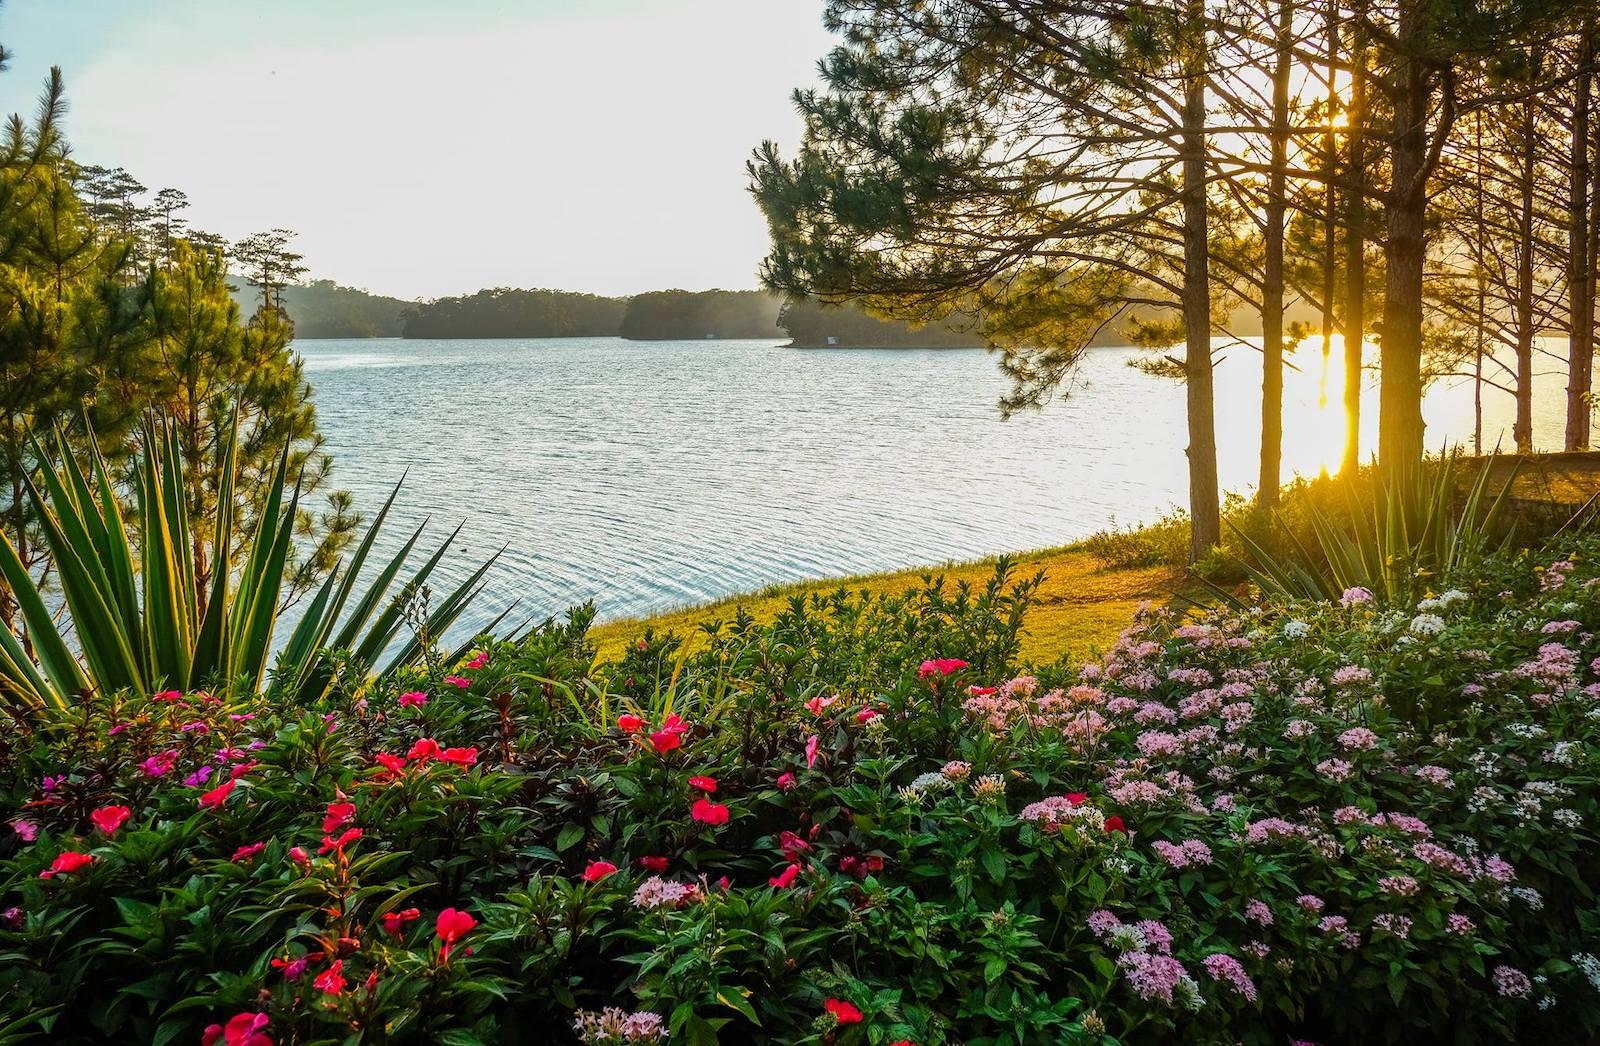 Image of the lake at the Binh An Village Resort in Da Lat, Vietnam